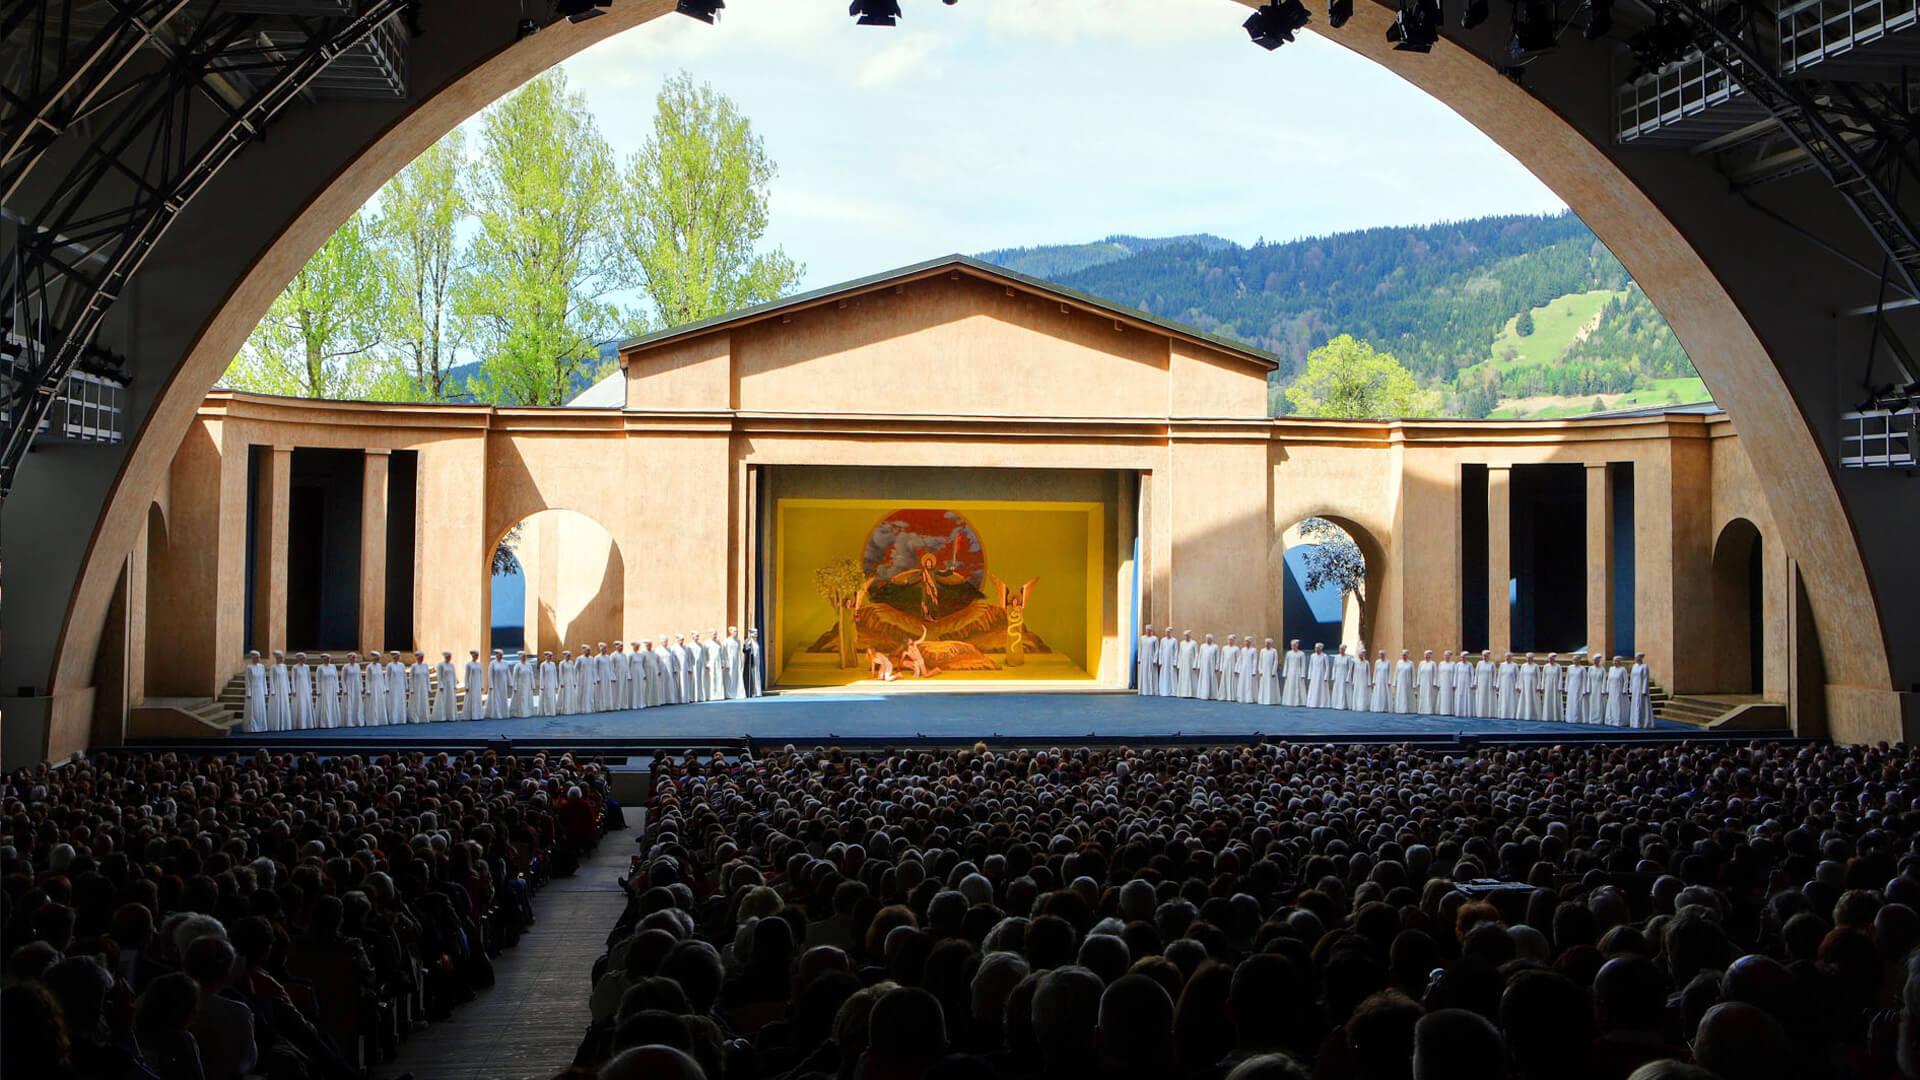 Biohotel Bavaria Passionsspiele Oberammergau